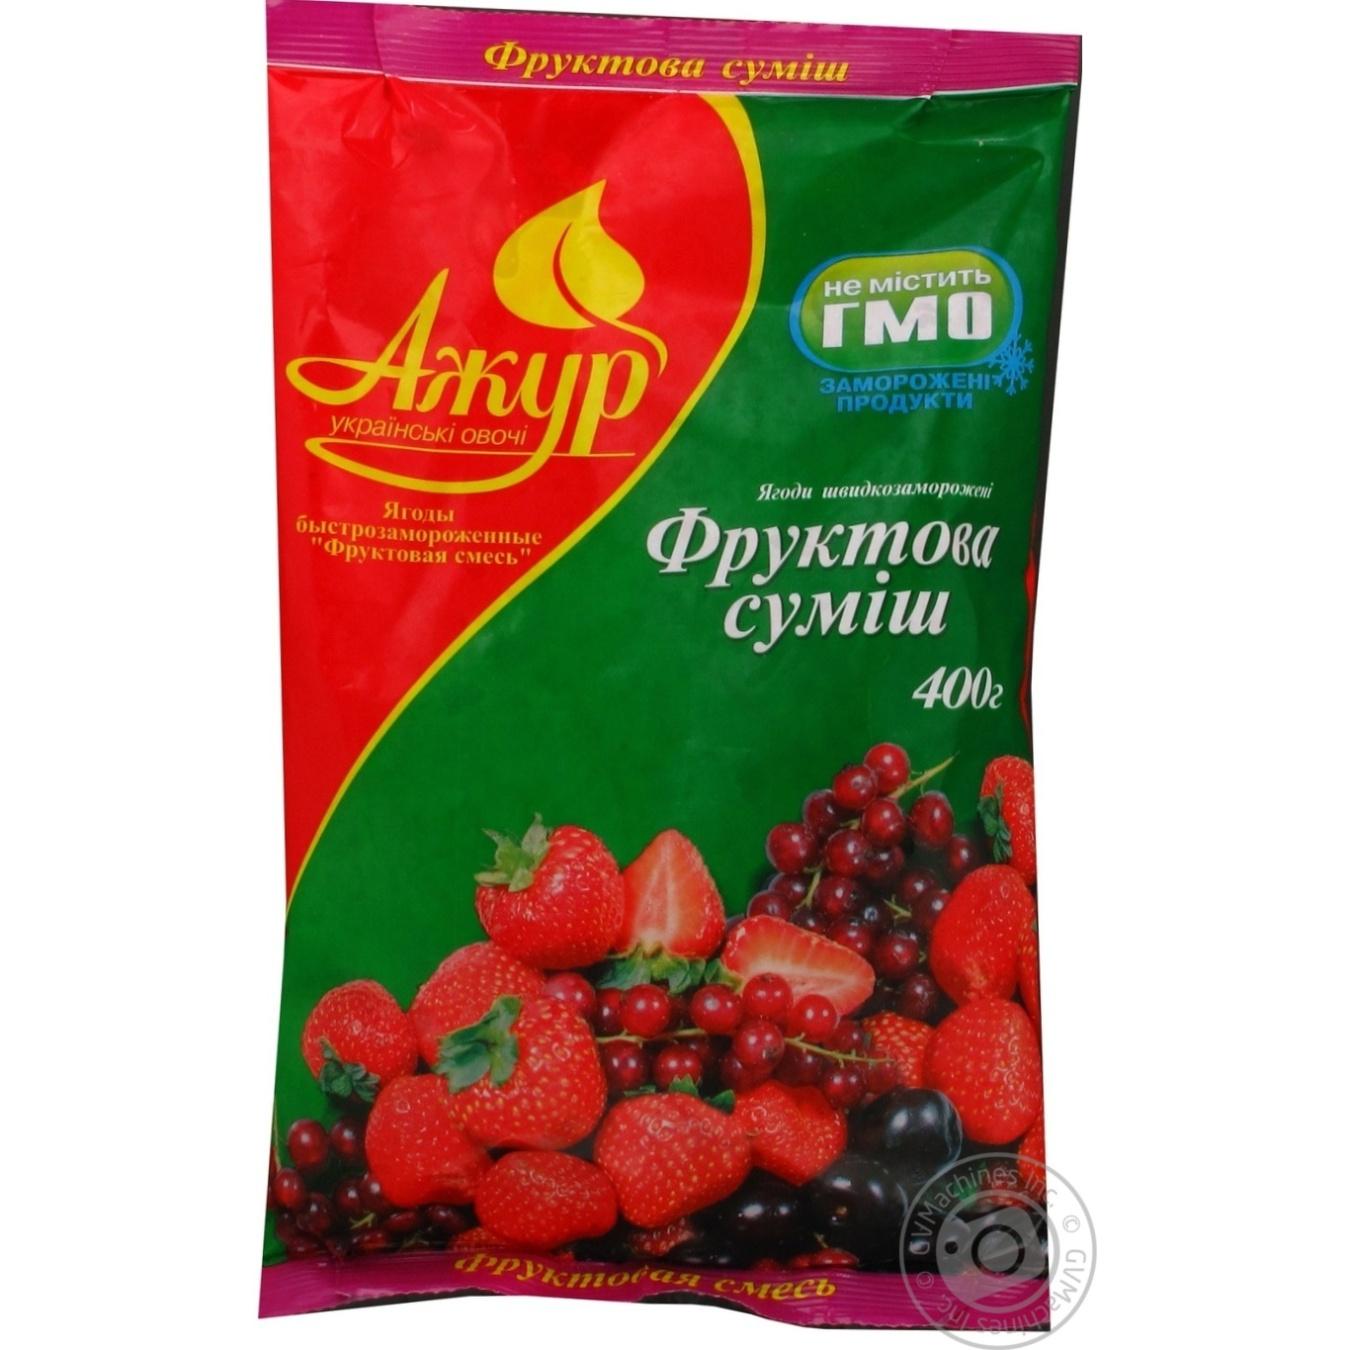 Berry mix Azhur frozen 400g Ukraine → Frozen → Fruits